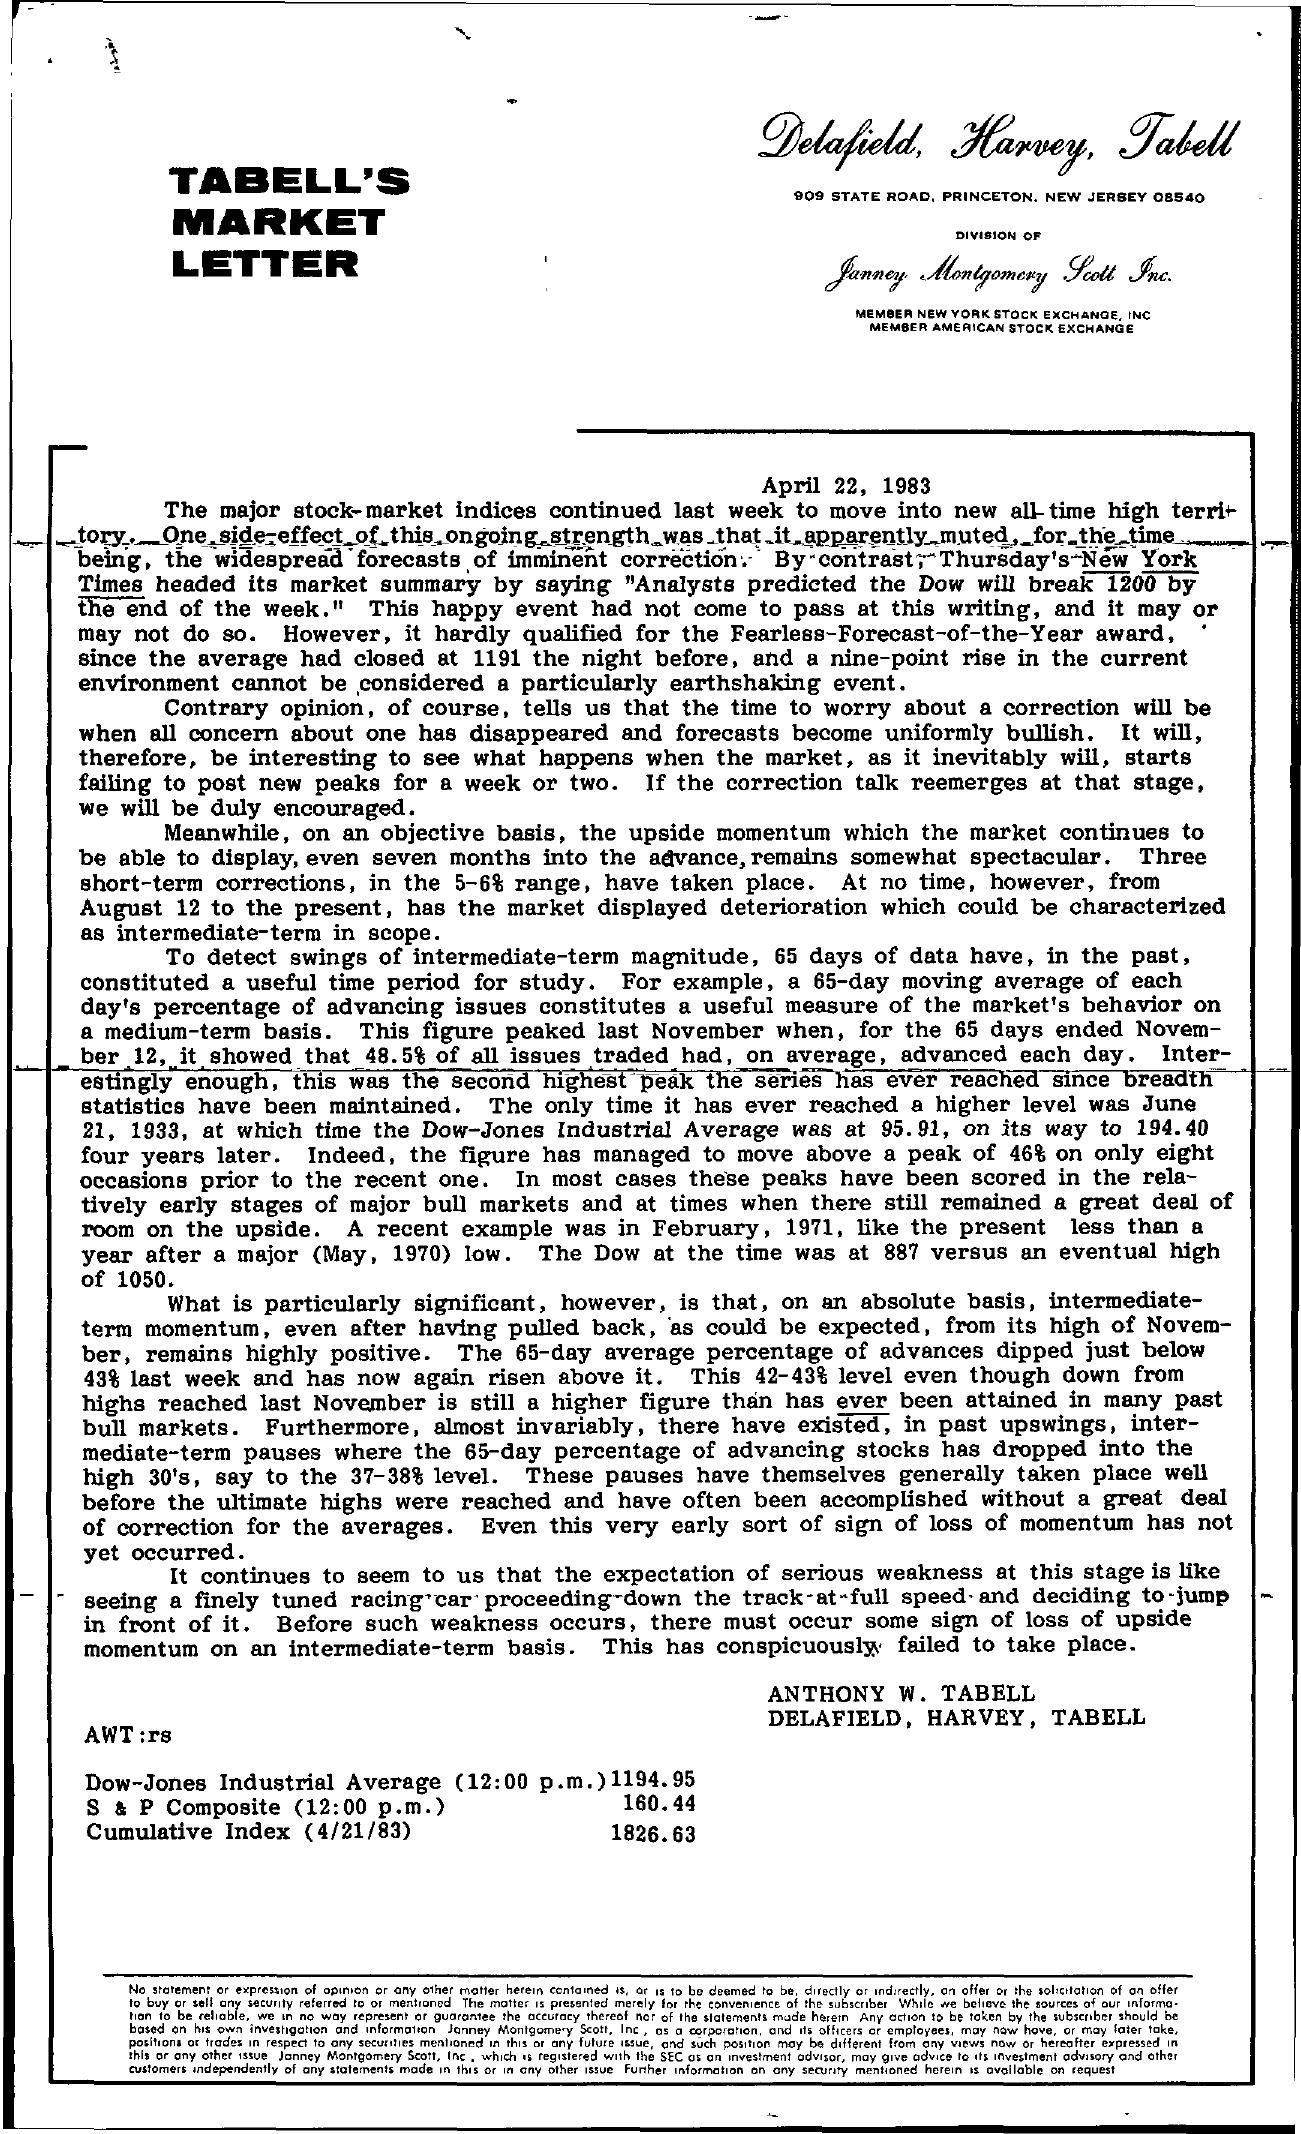 Tabell's Market Letter - April 22, 1983